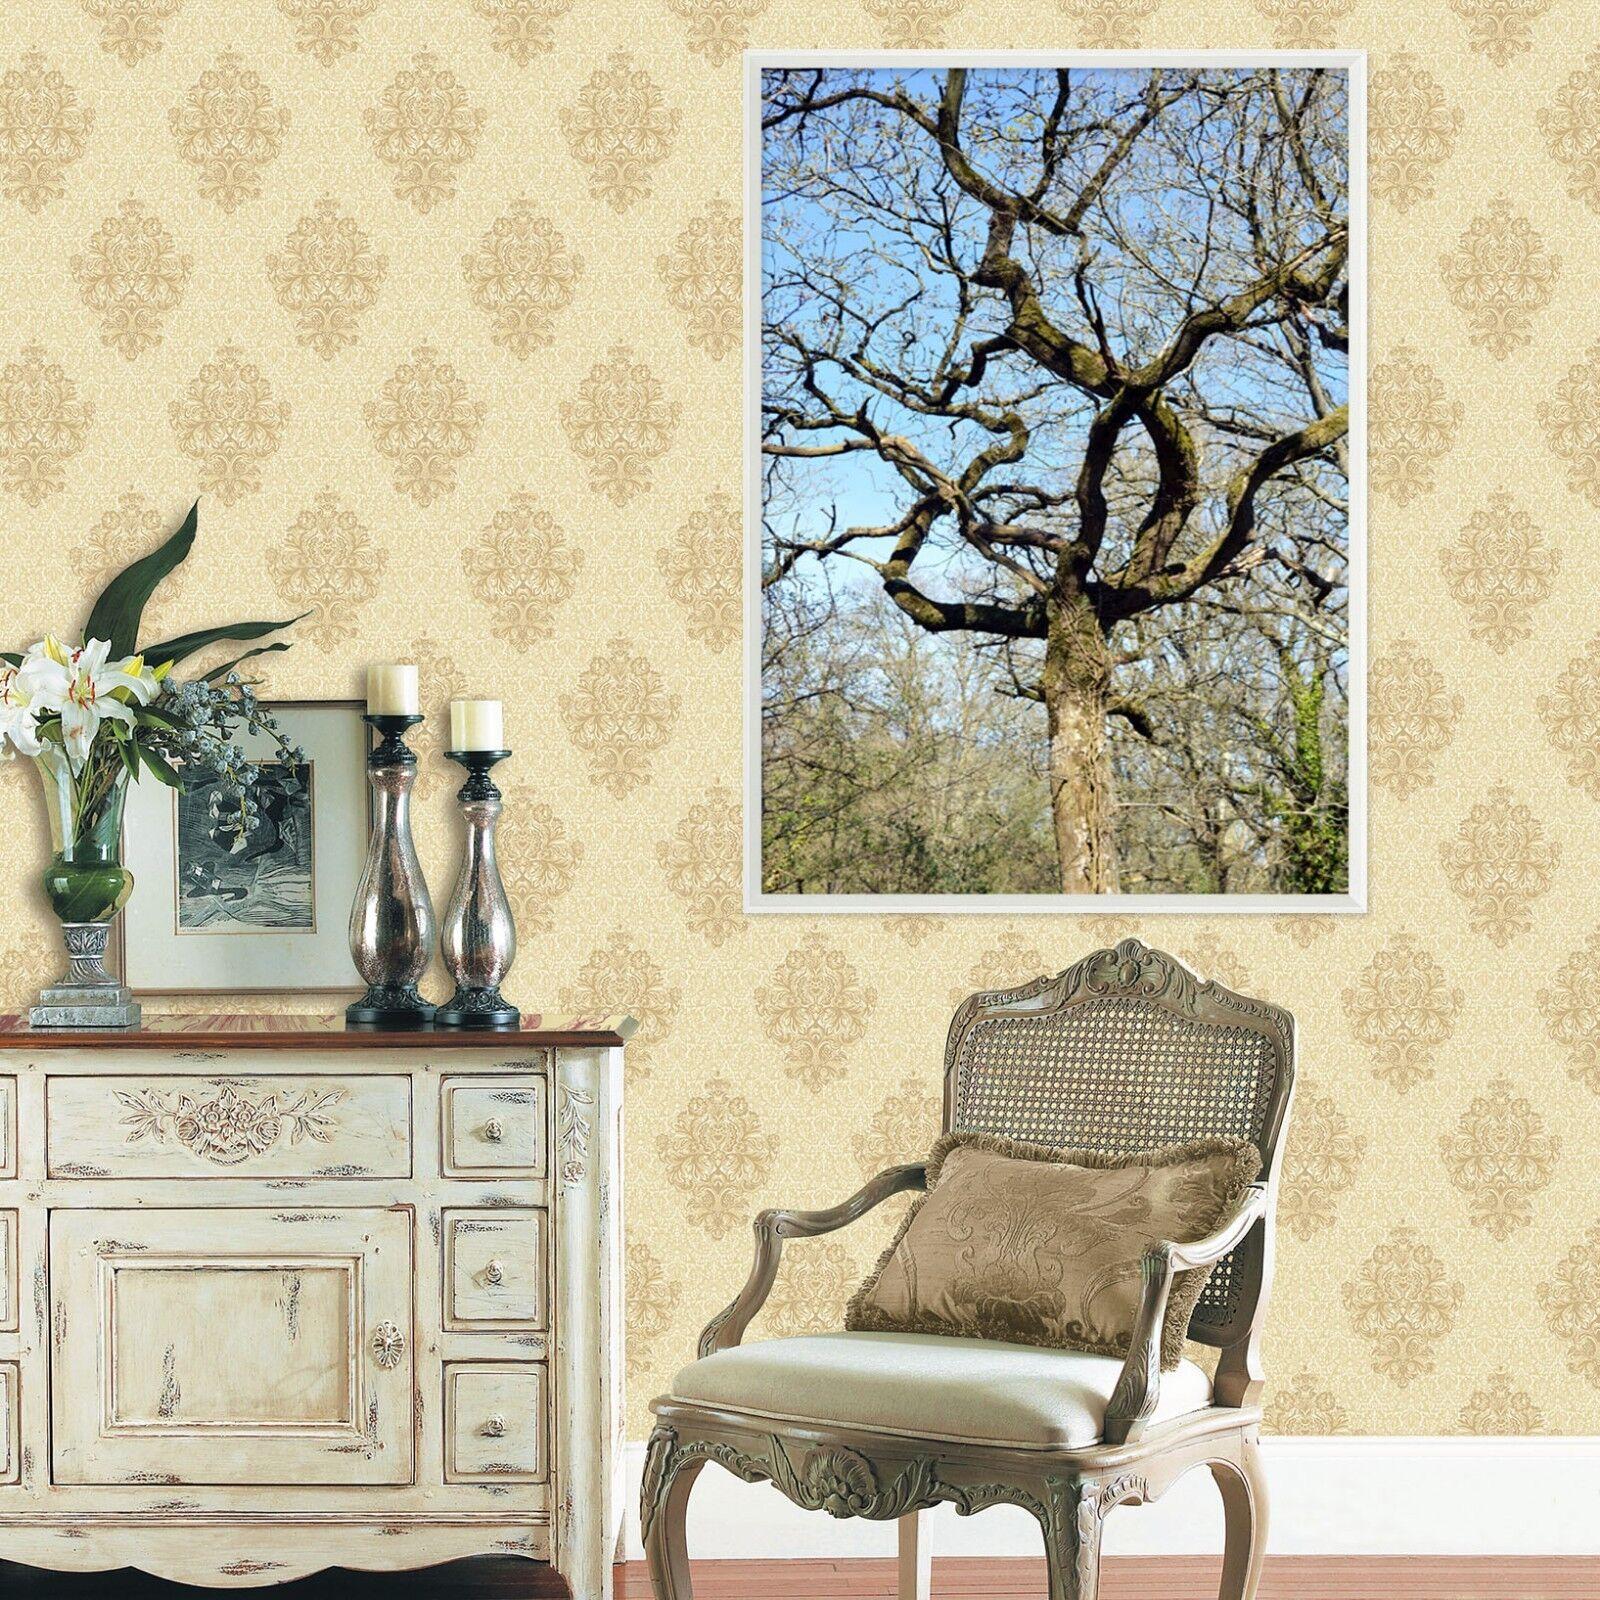 3D Nackt Baum 6 Gerahmt Poster Daheim Dekor Drucken Malerei Kunst AJ